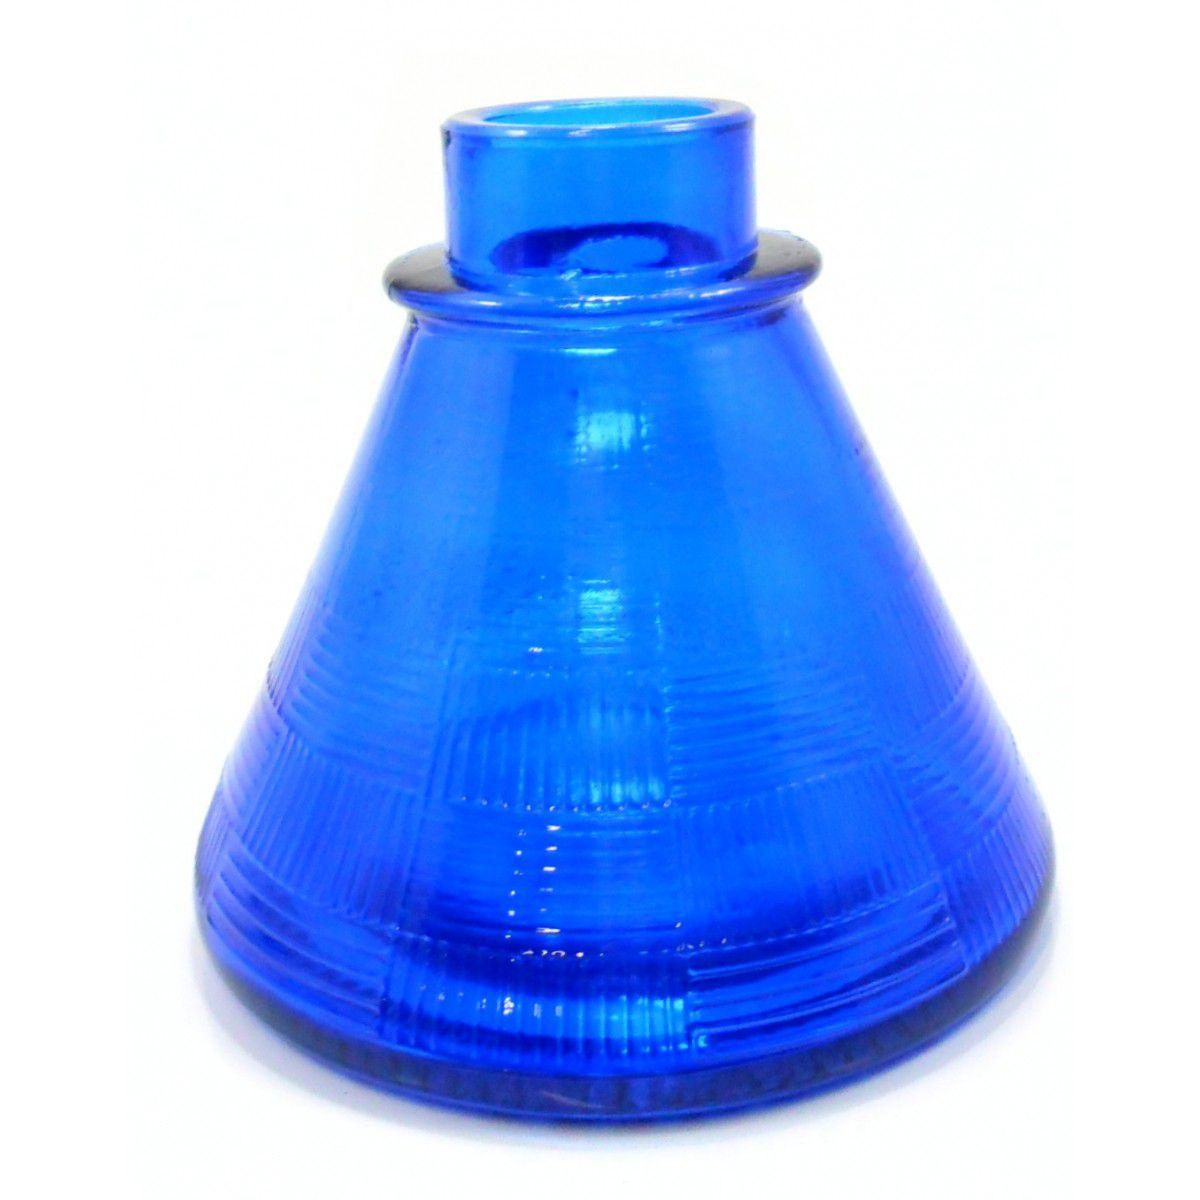 Vaso/Base para narguile base larga encaixe macho, 11cm alt. P/stems Judith, Triton, Amazon, Mya, etc Azul